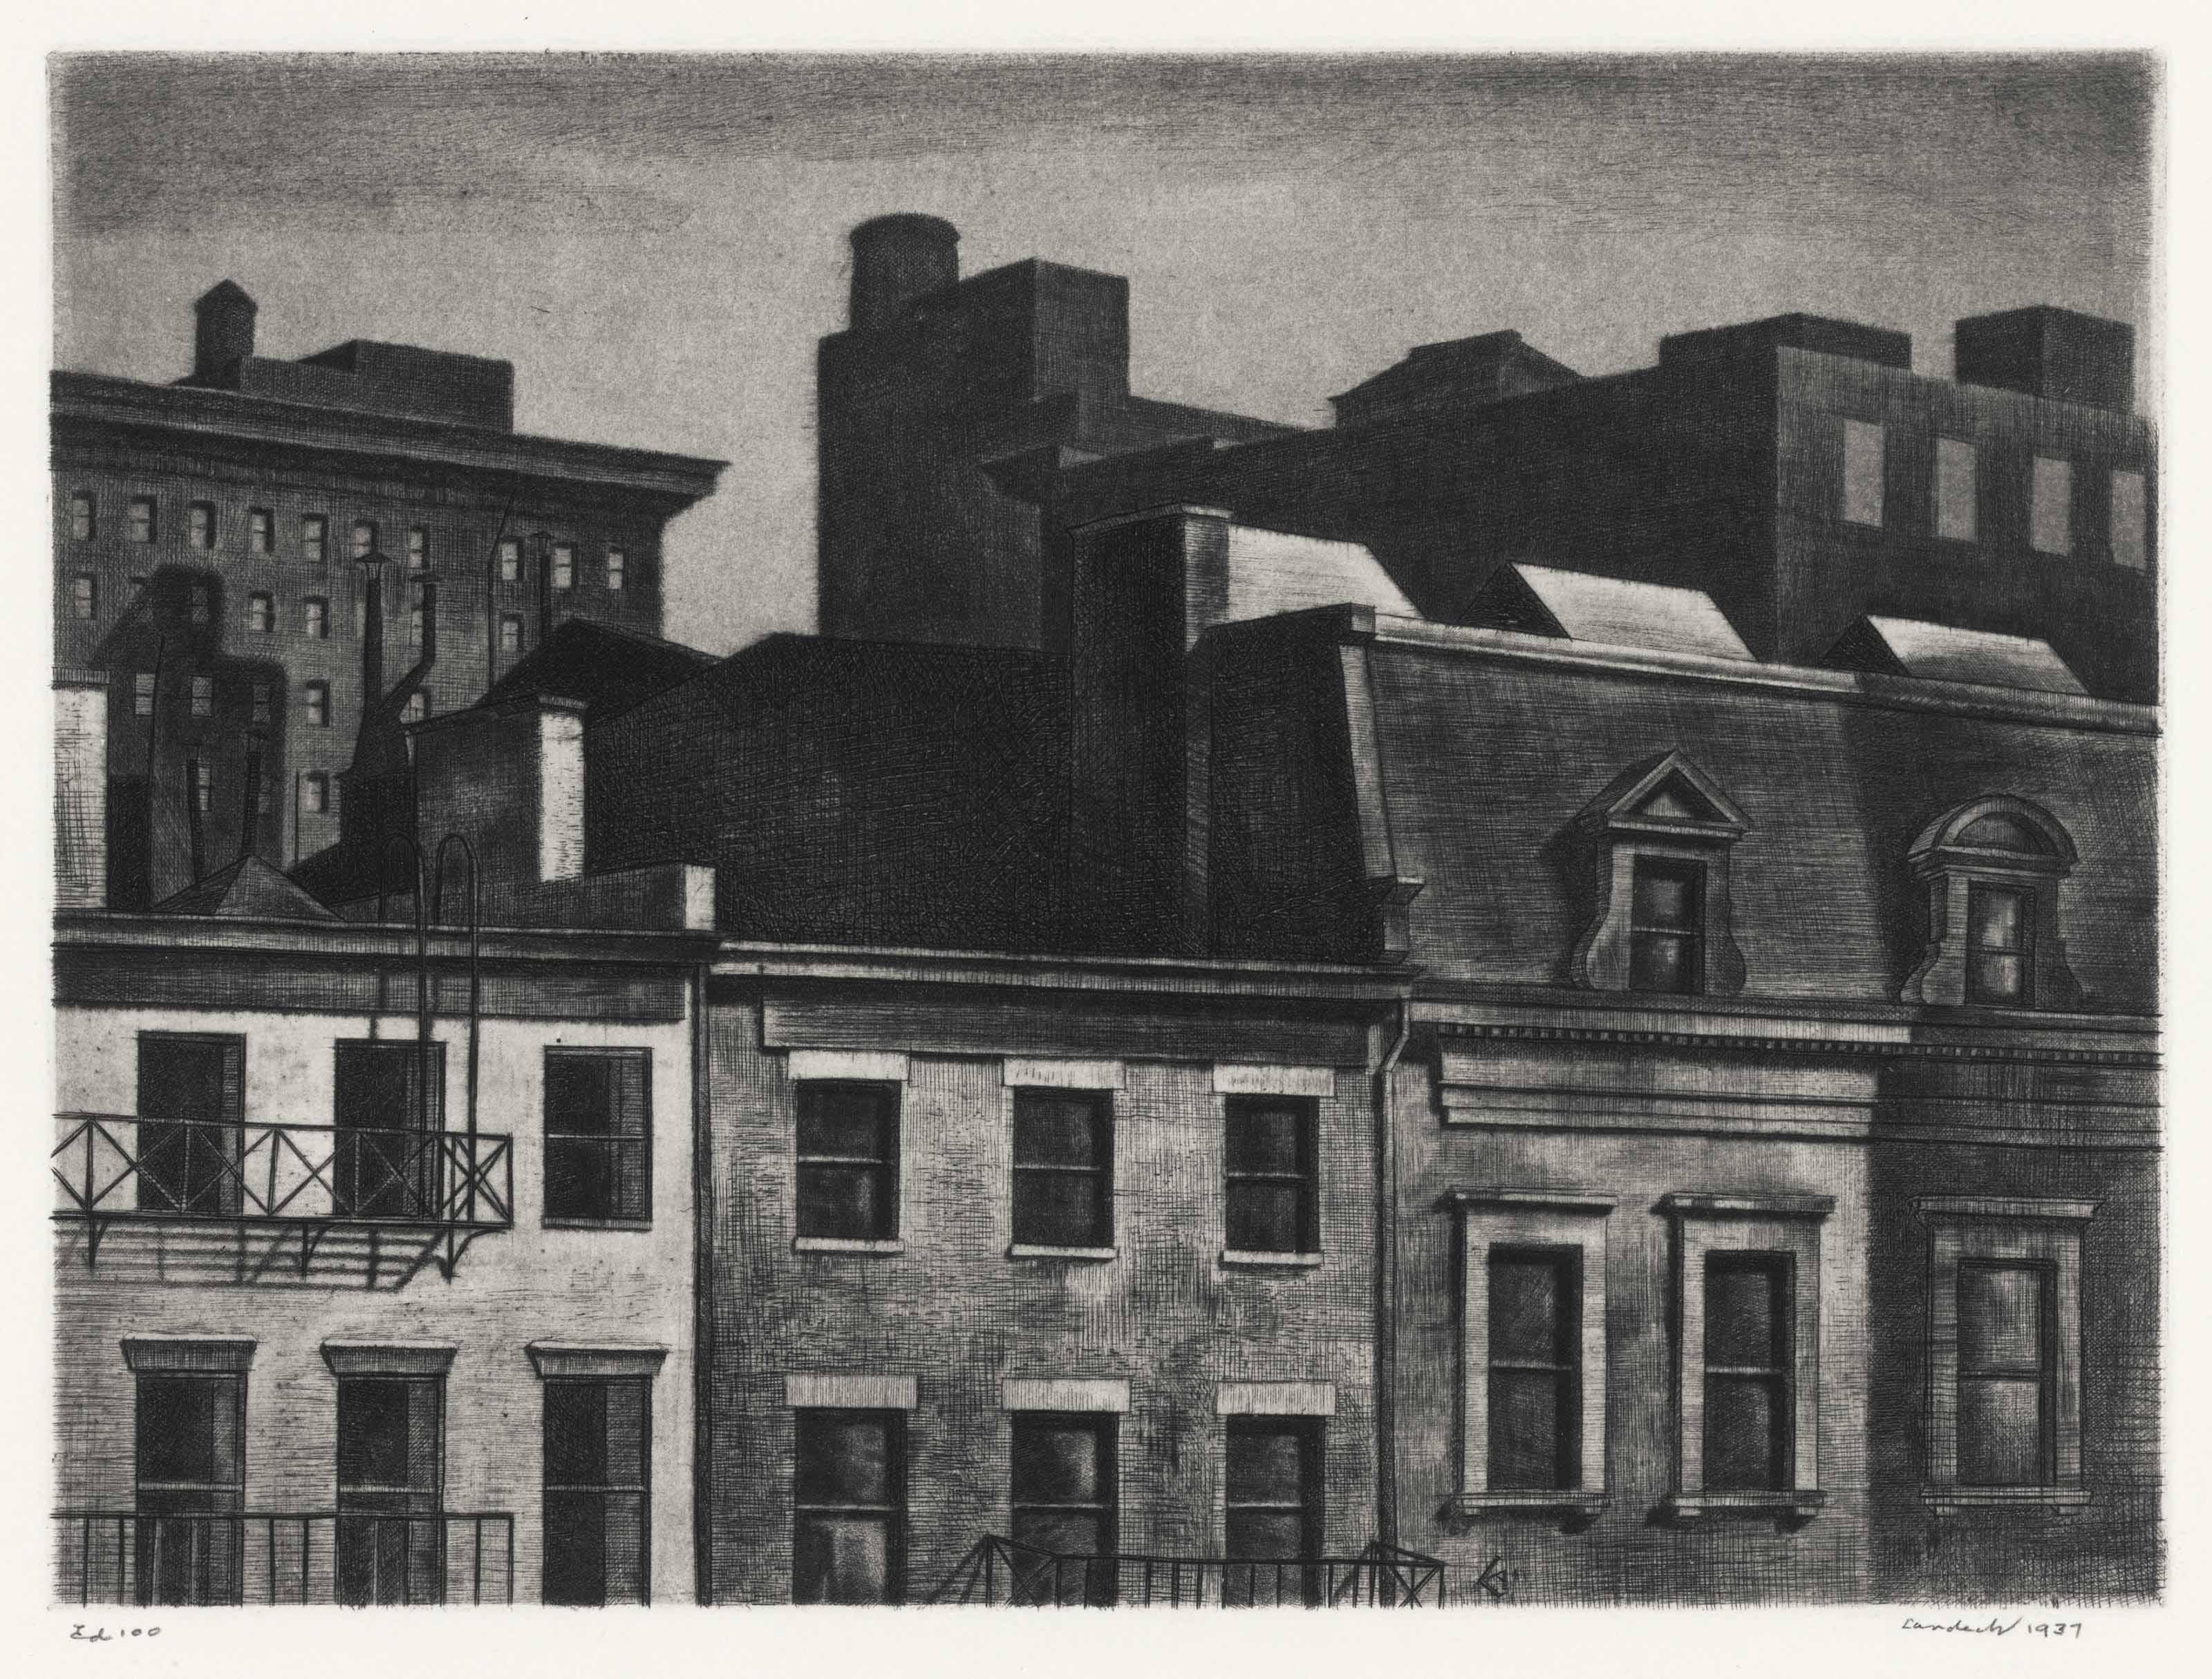 Housetops, 14th Street